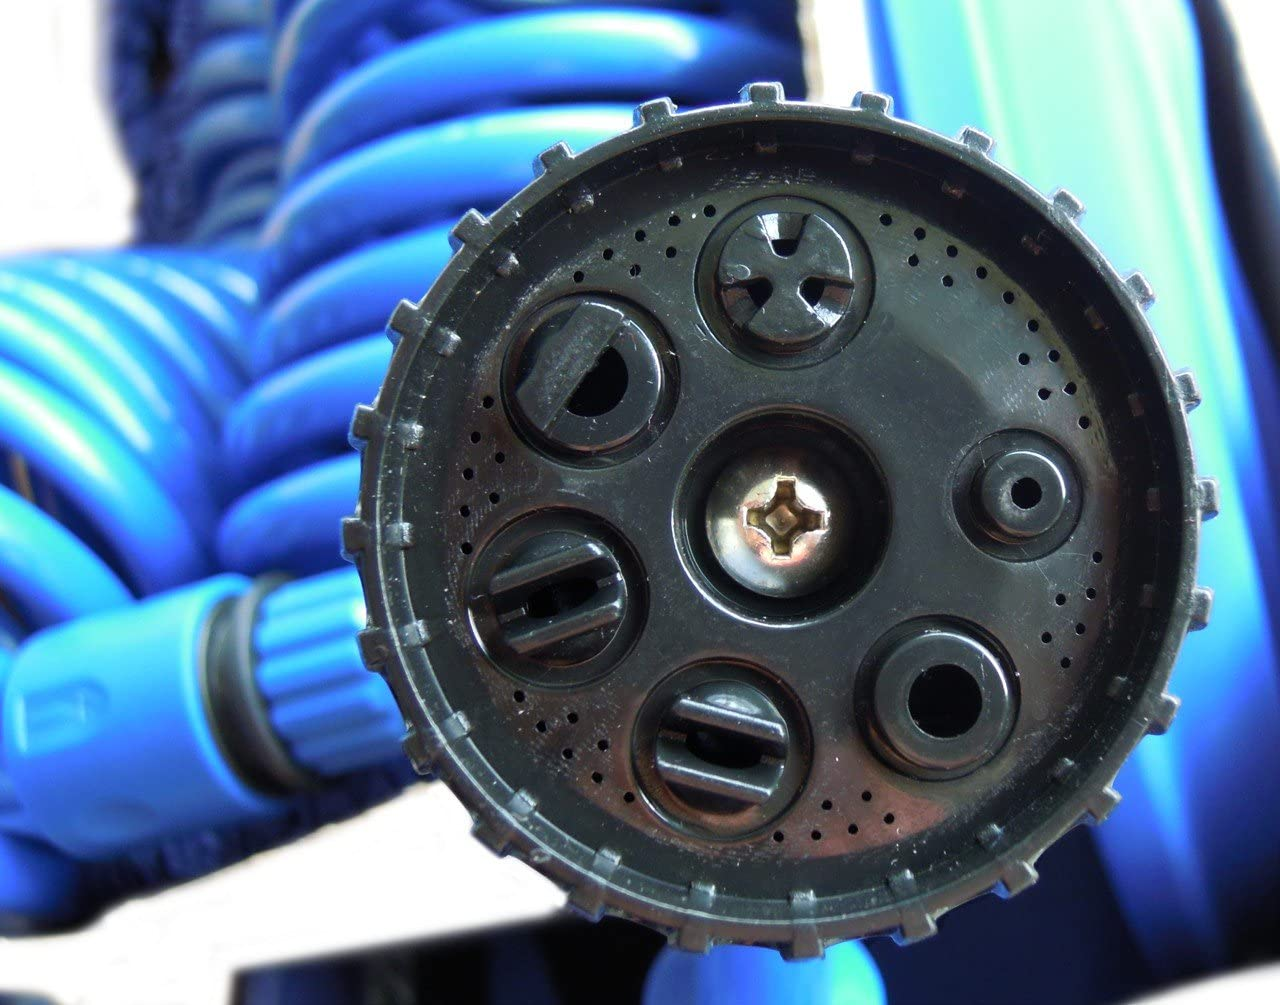 Yachticon Tuyau dArrosage Spirale Maxi 15 m Pistolet Multi-Jets 7 Positions